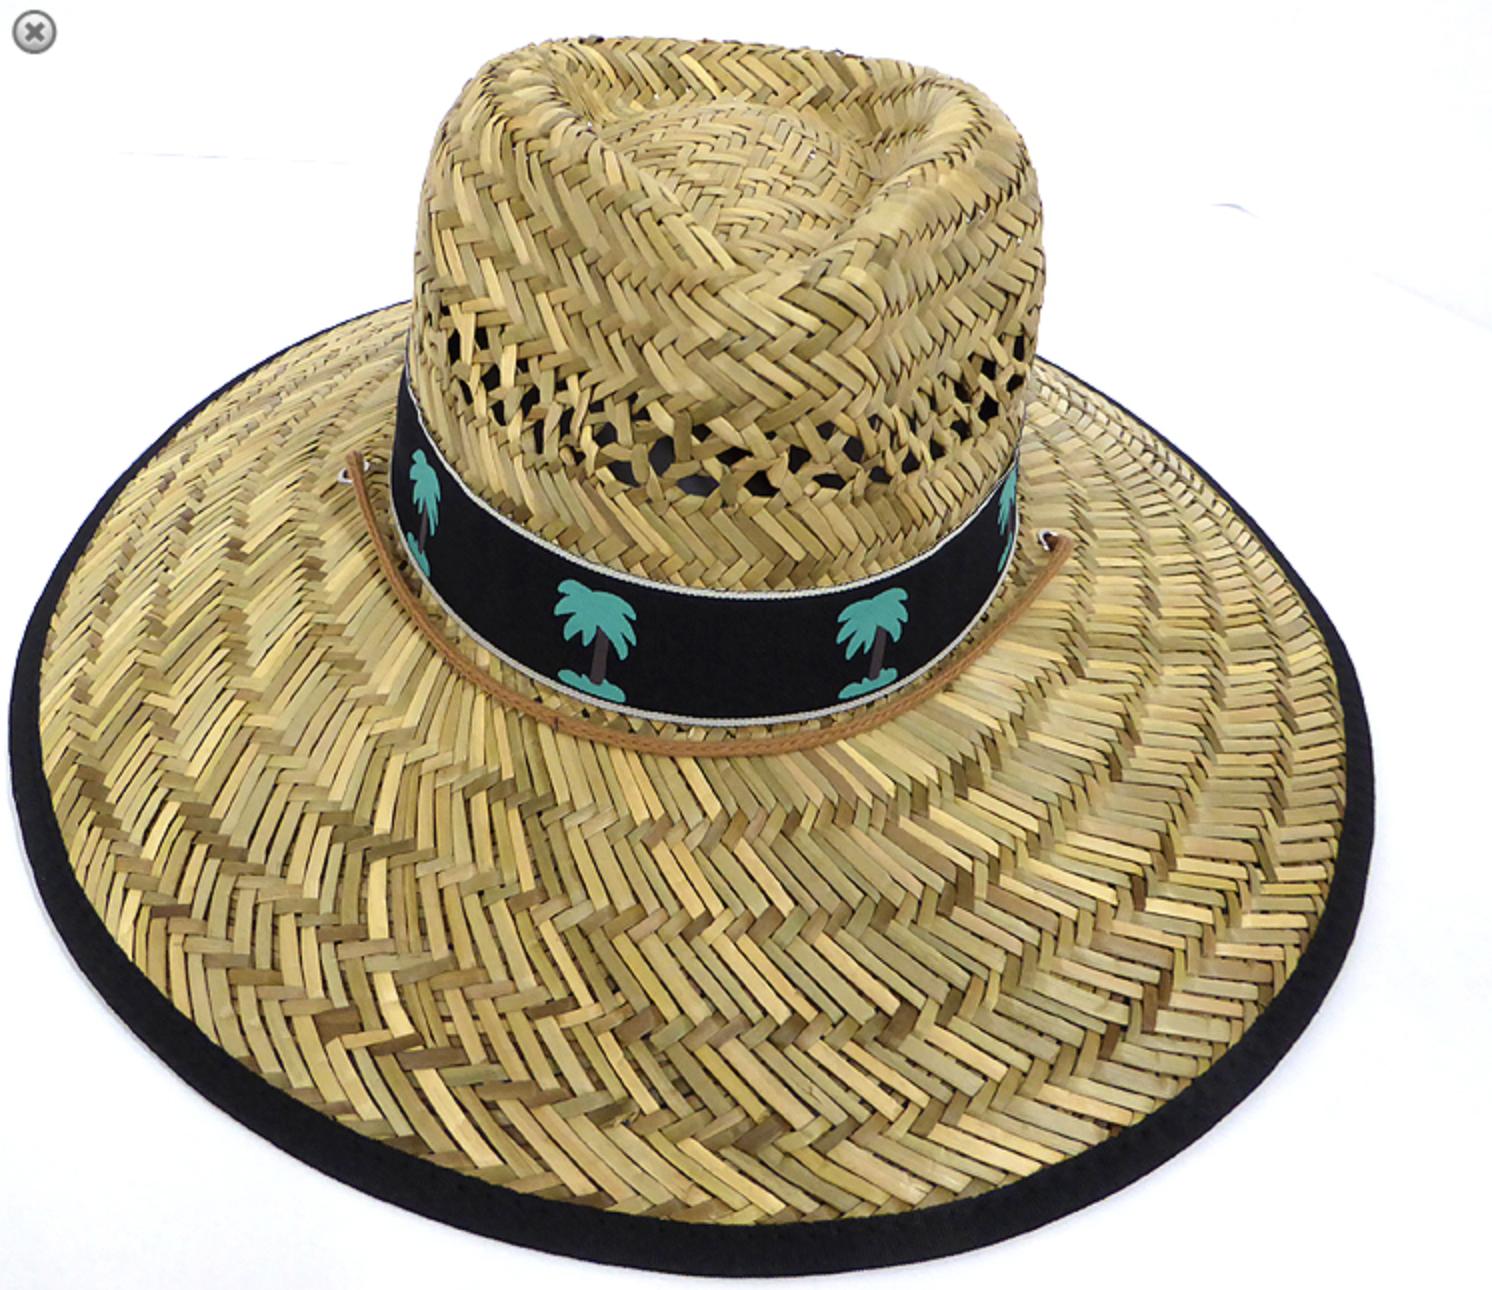 Revelstoke Trading Post Tropical Straw Hat